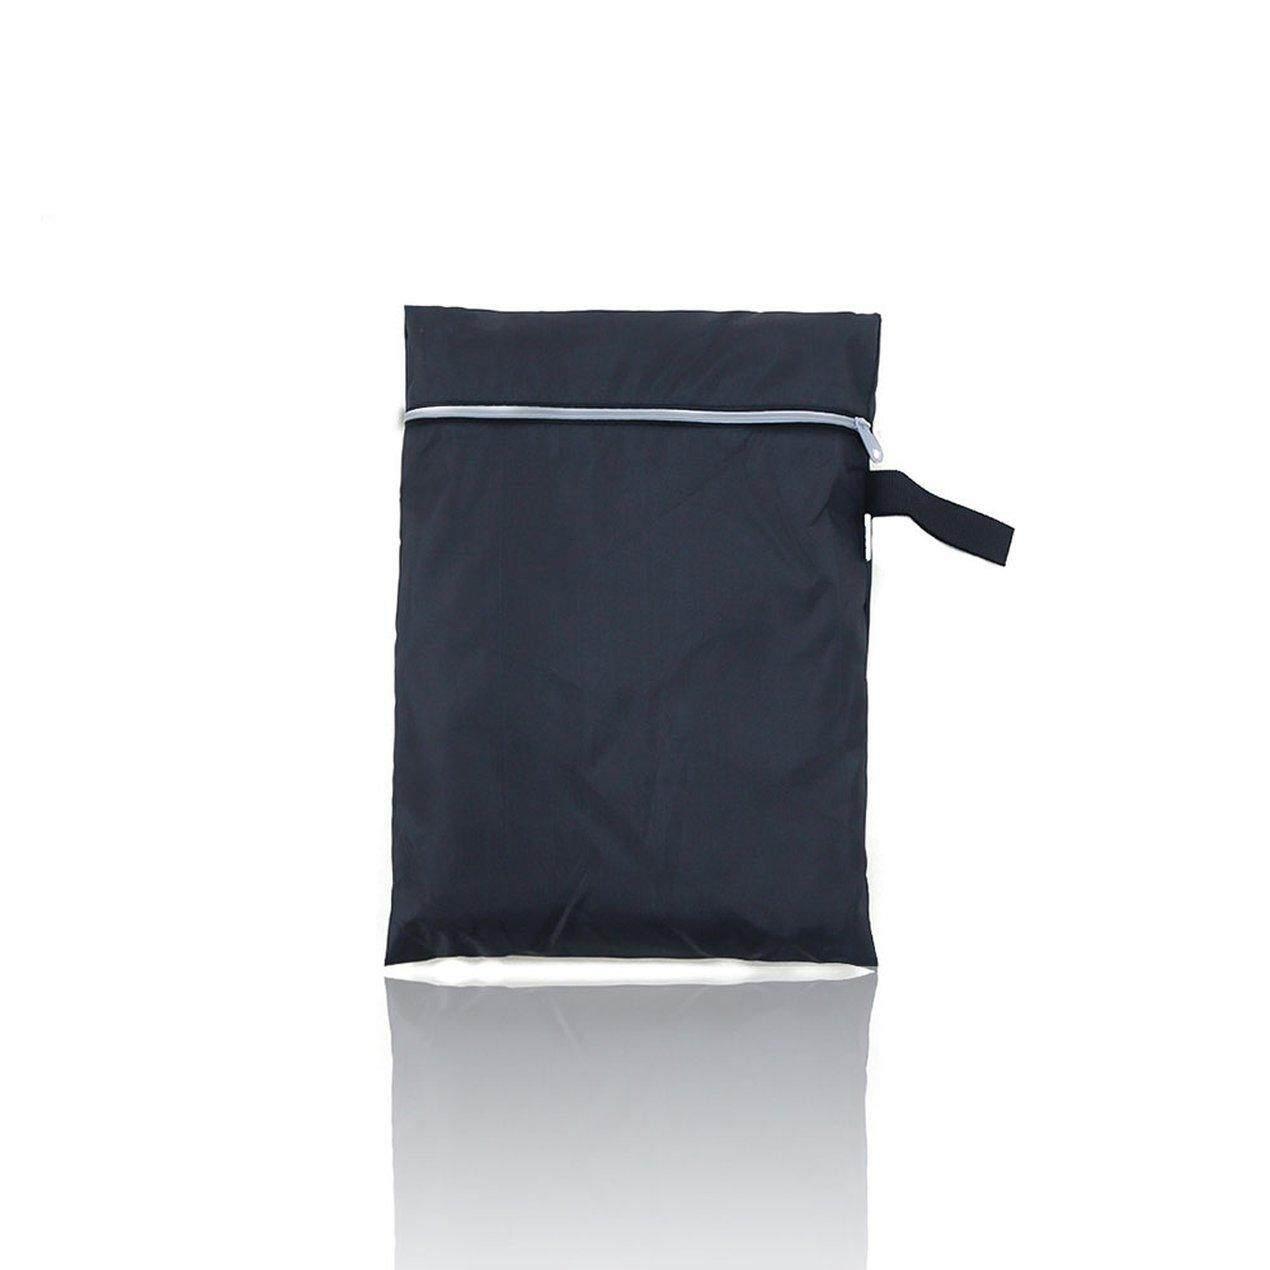 Best Sales Oxford Cloth Outdoor Furniture Cover Garden Dustproof Waterproof Cover